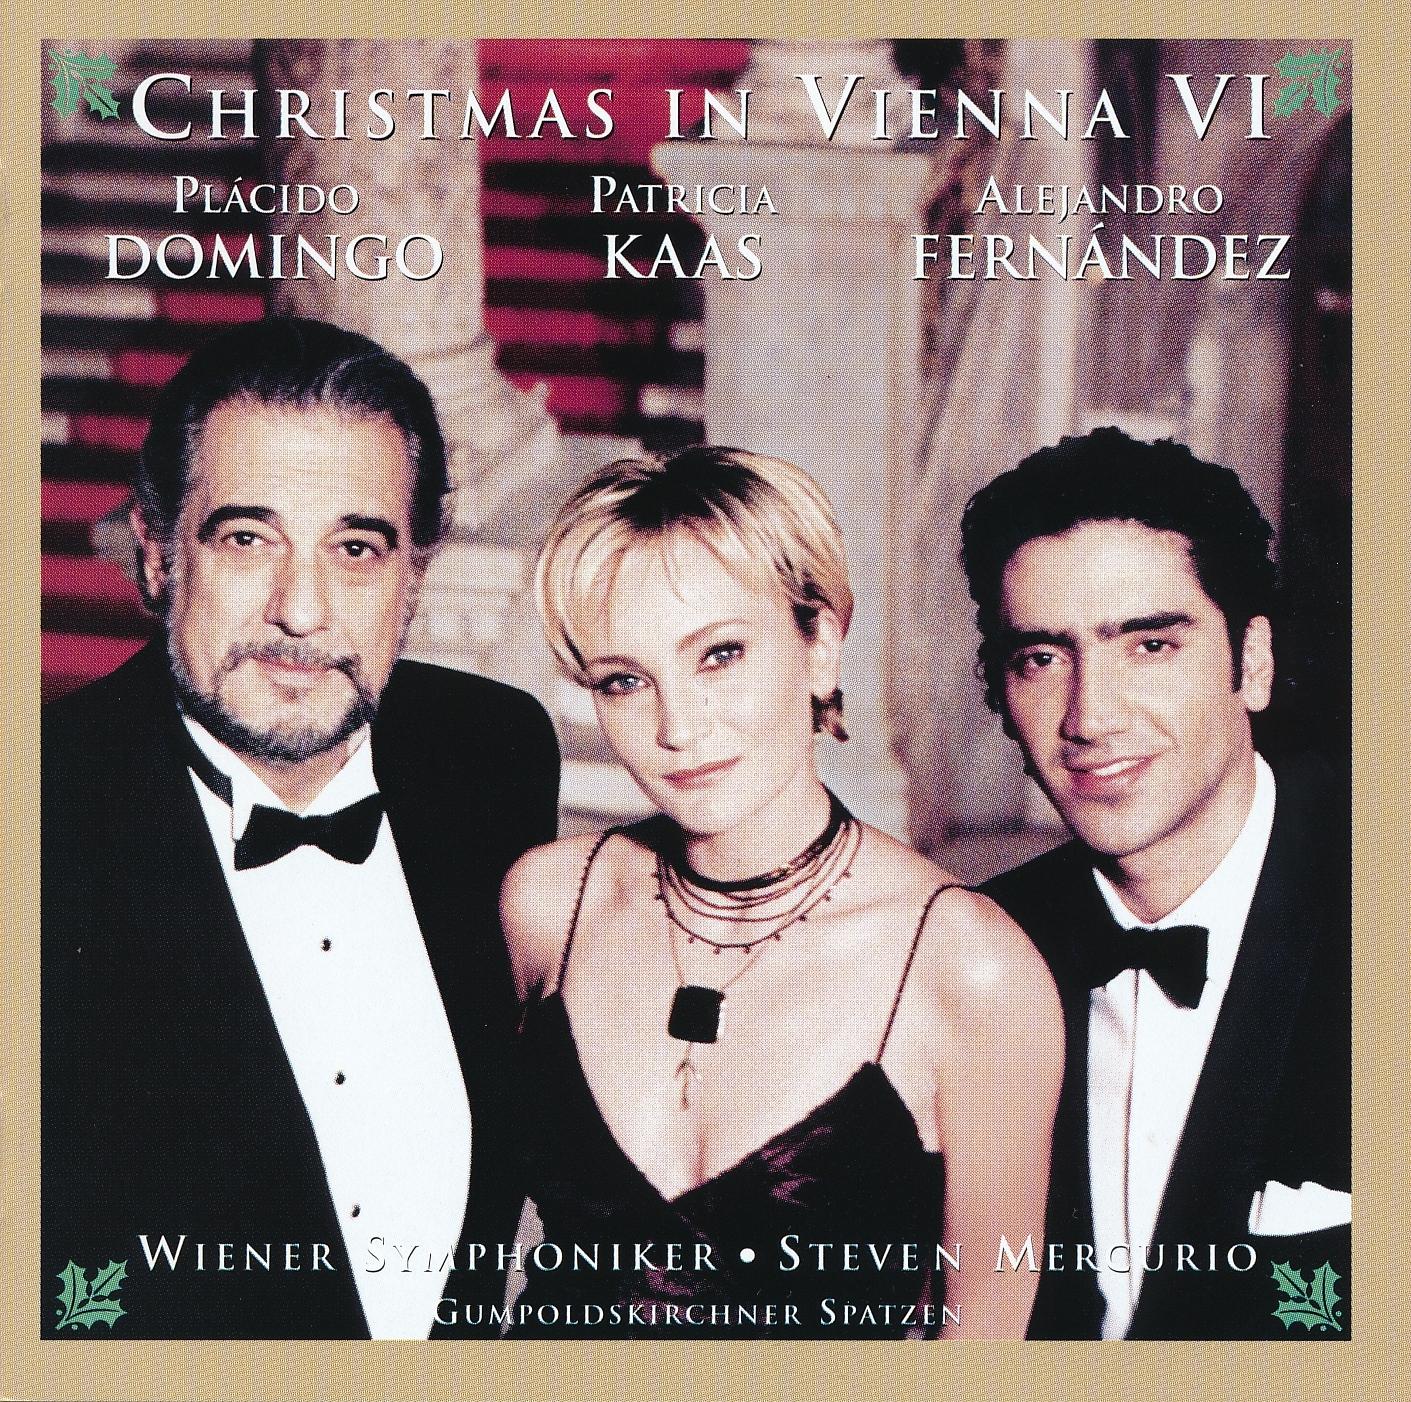 Christmas in Vienna VI